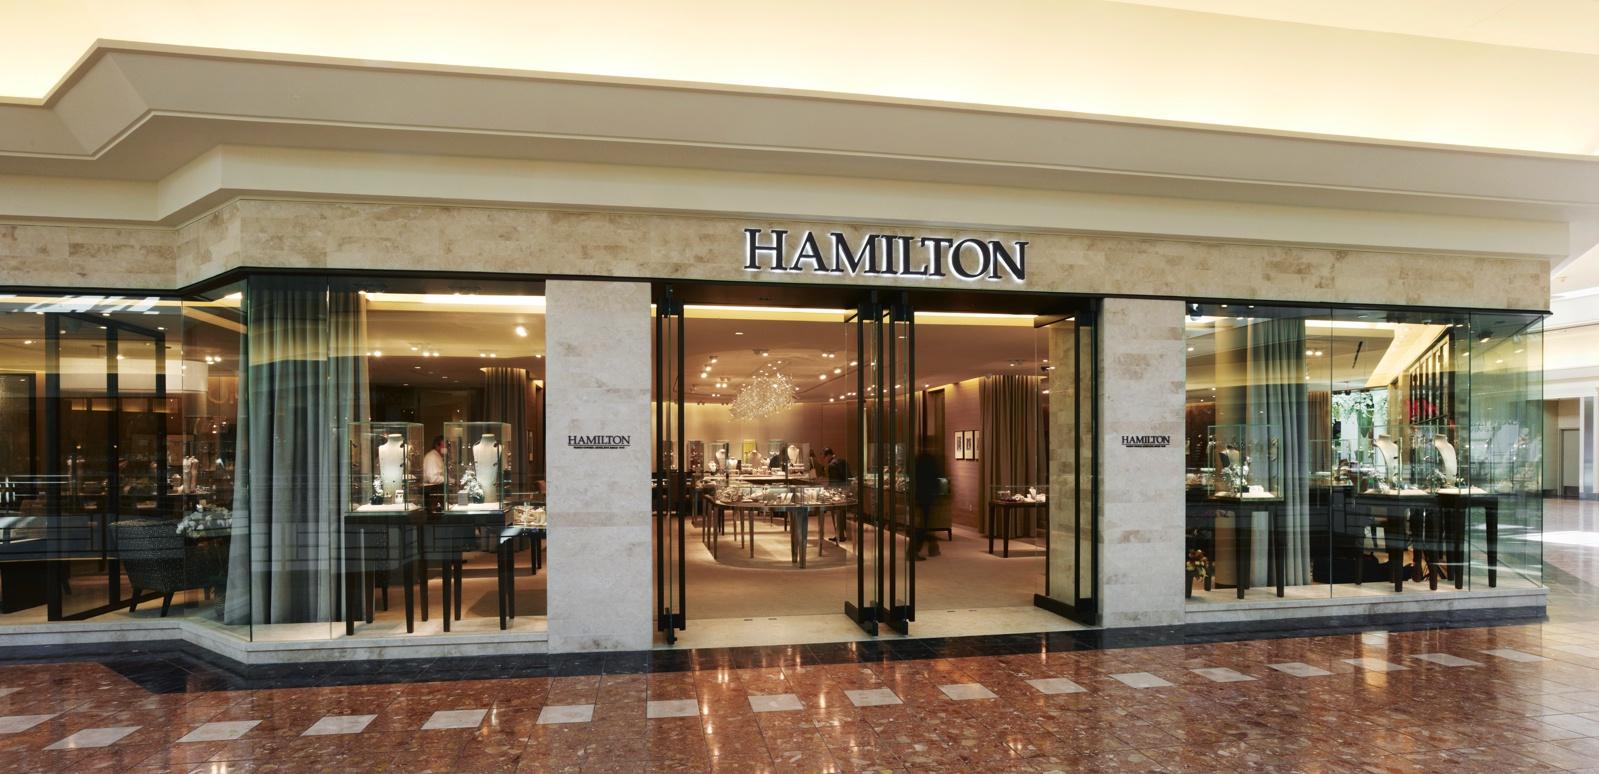 Hamilton Jewelers, storefront